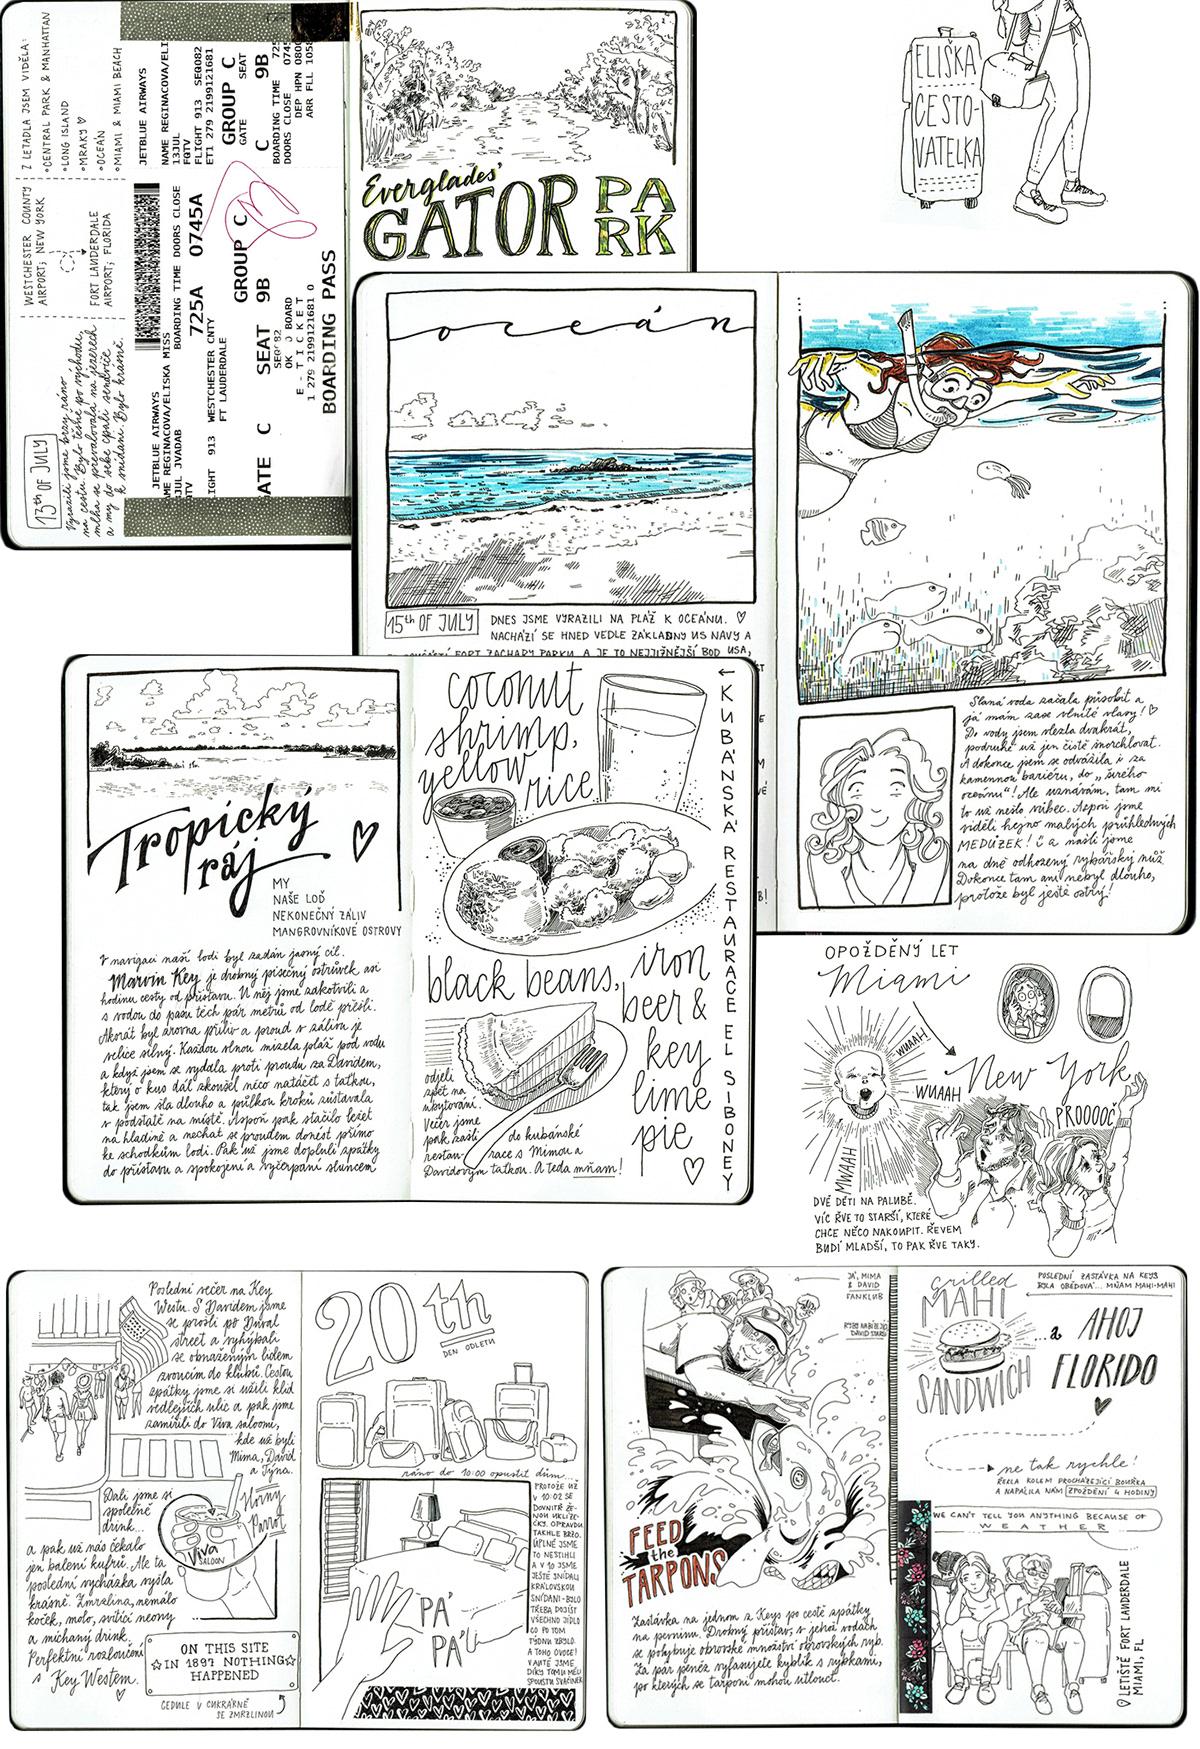 sketchbook usa sketch sketching Diary travel sketch ink lettering crosschatching Travel